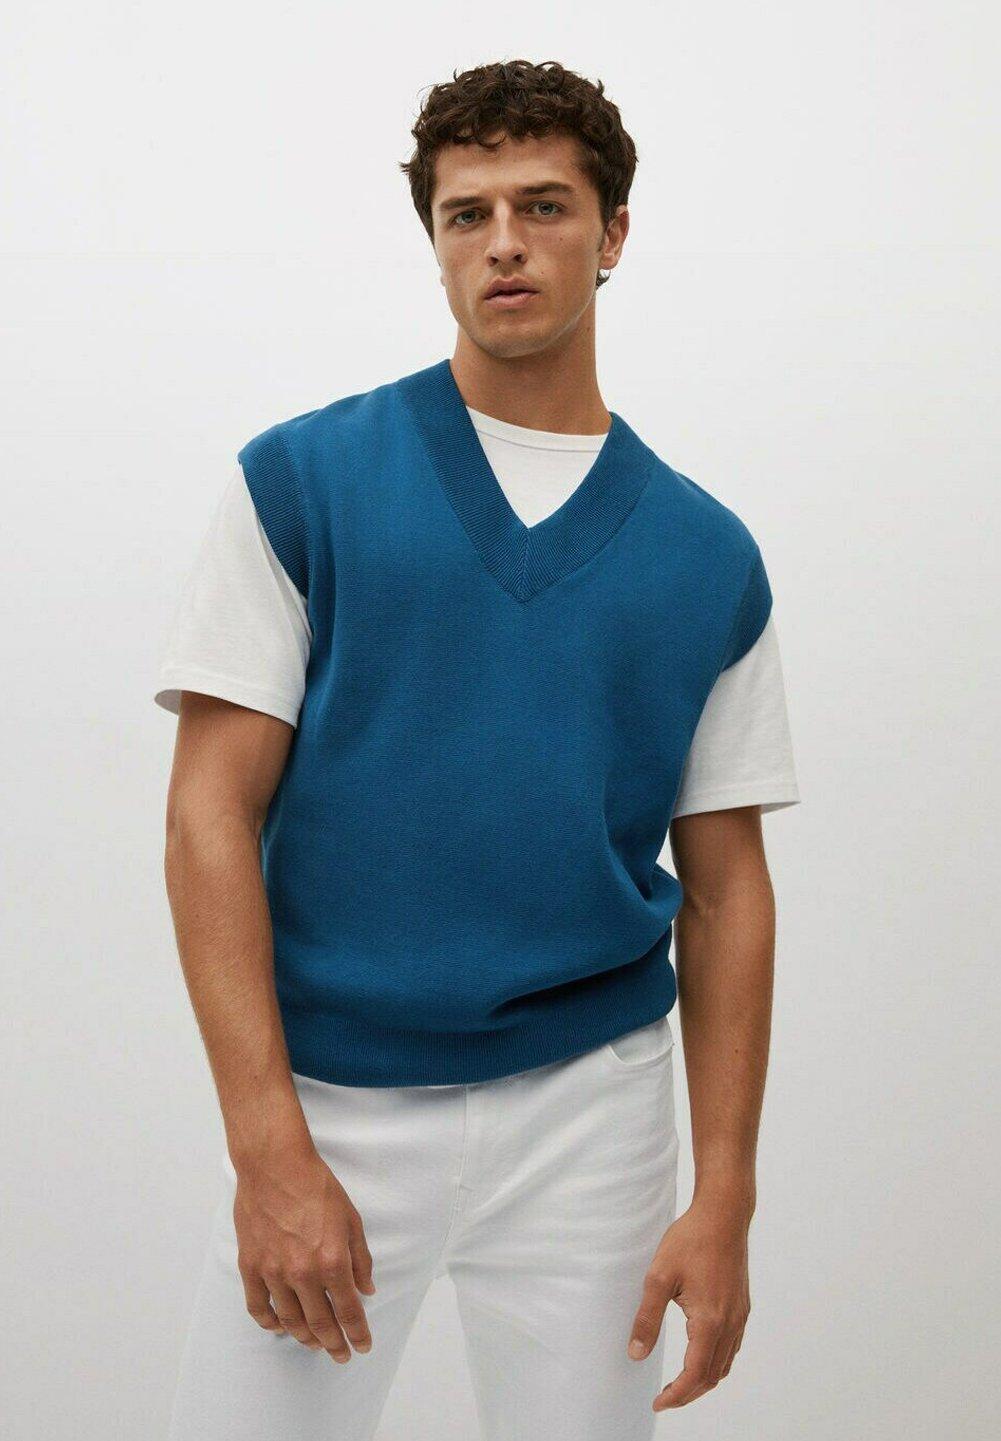 Homme AZULEJOV - Pullover